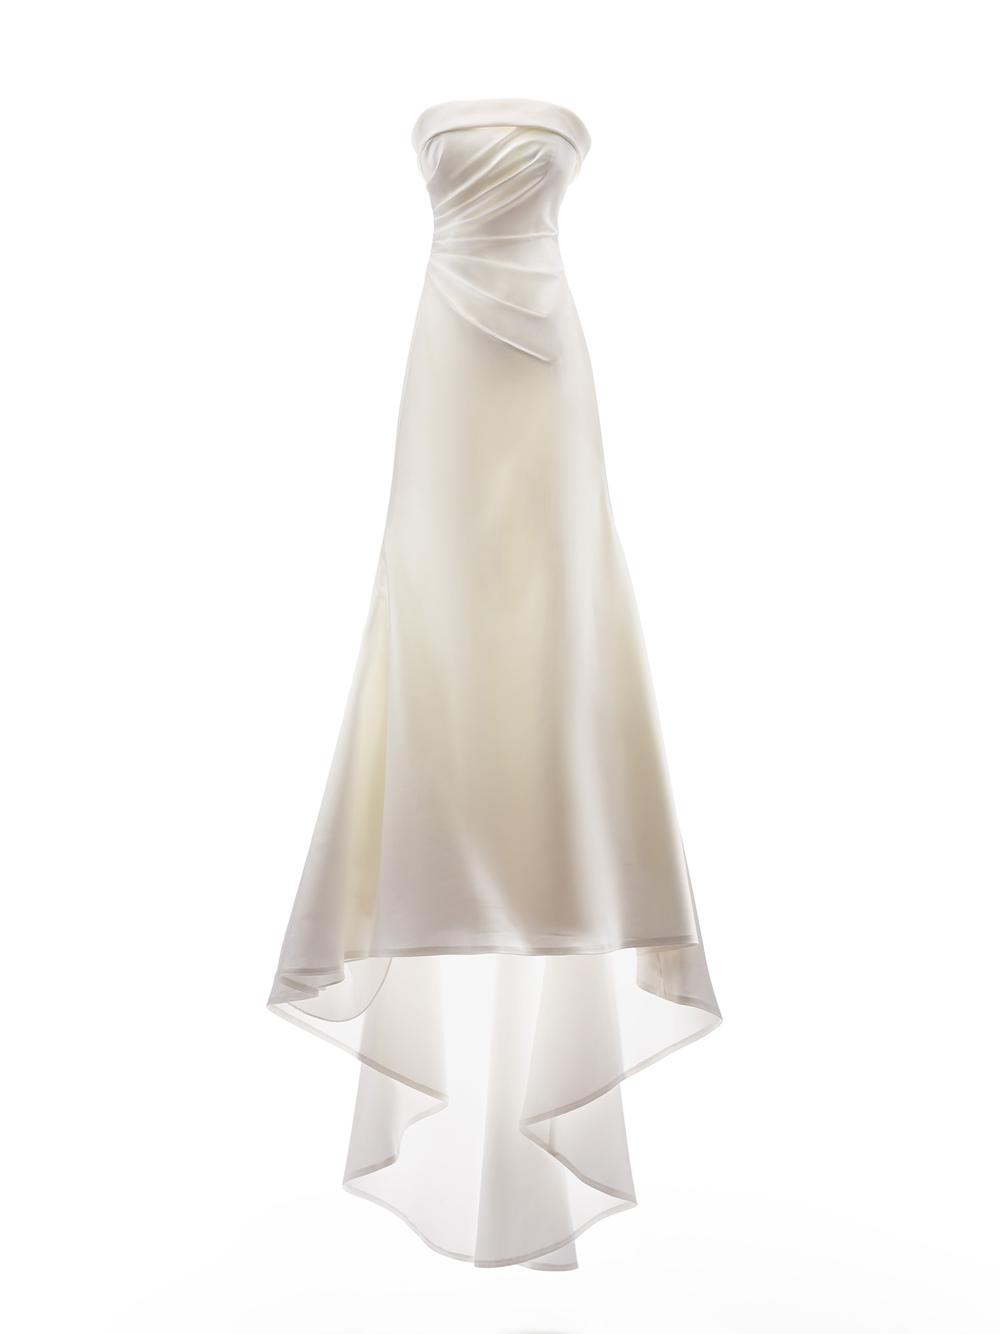 Marasha K(マーシャ ケイ) オーダードレス コレクション